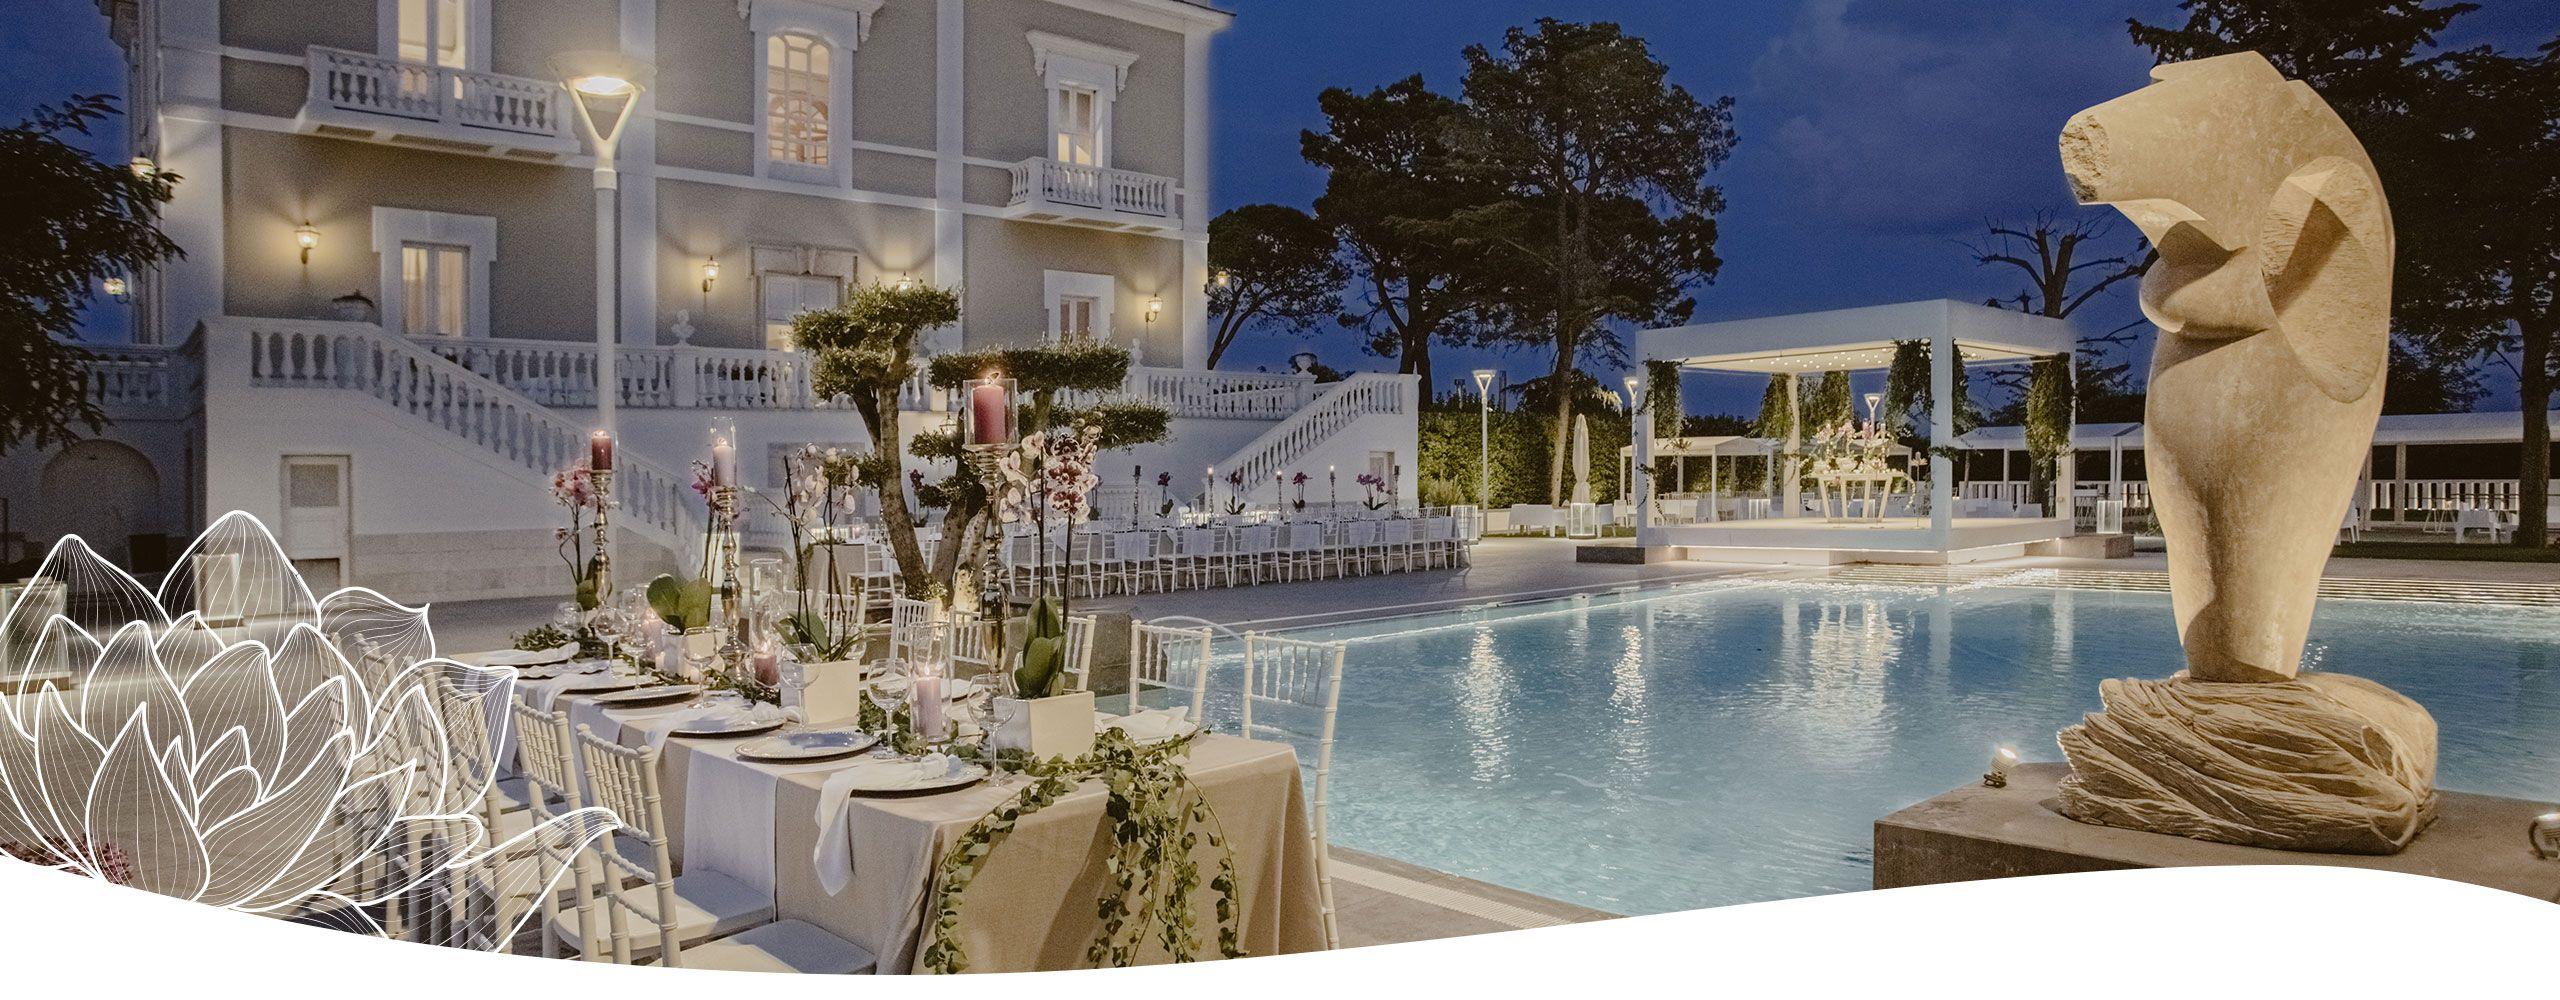 wedding planner puglia allestimento in piscina